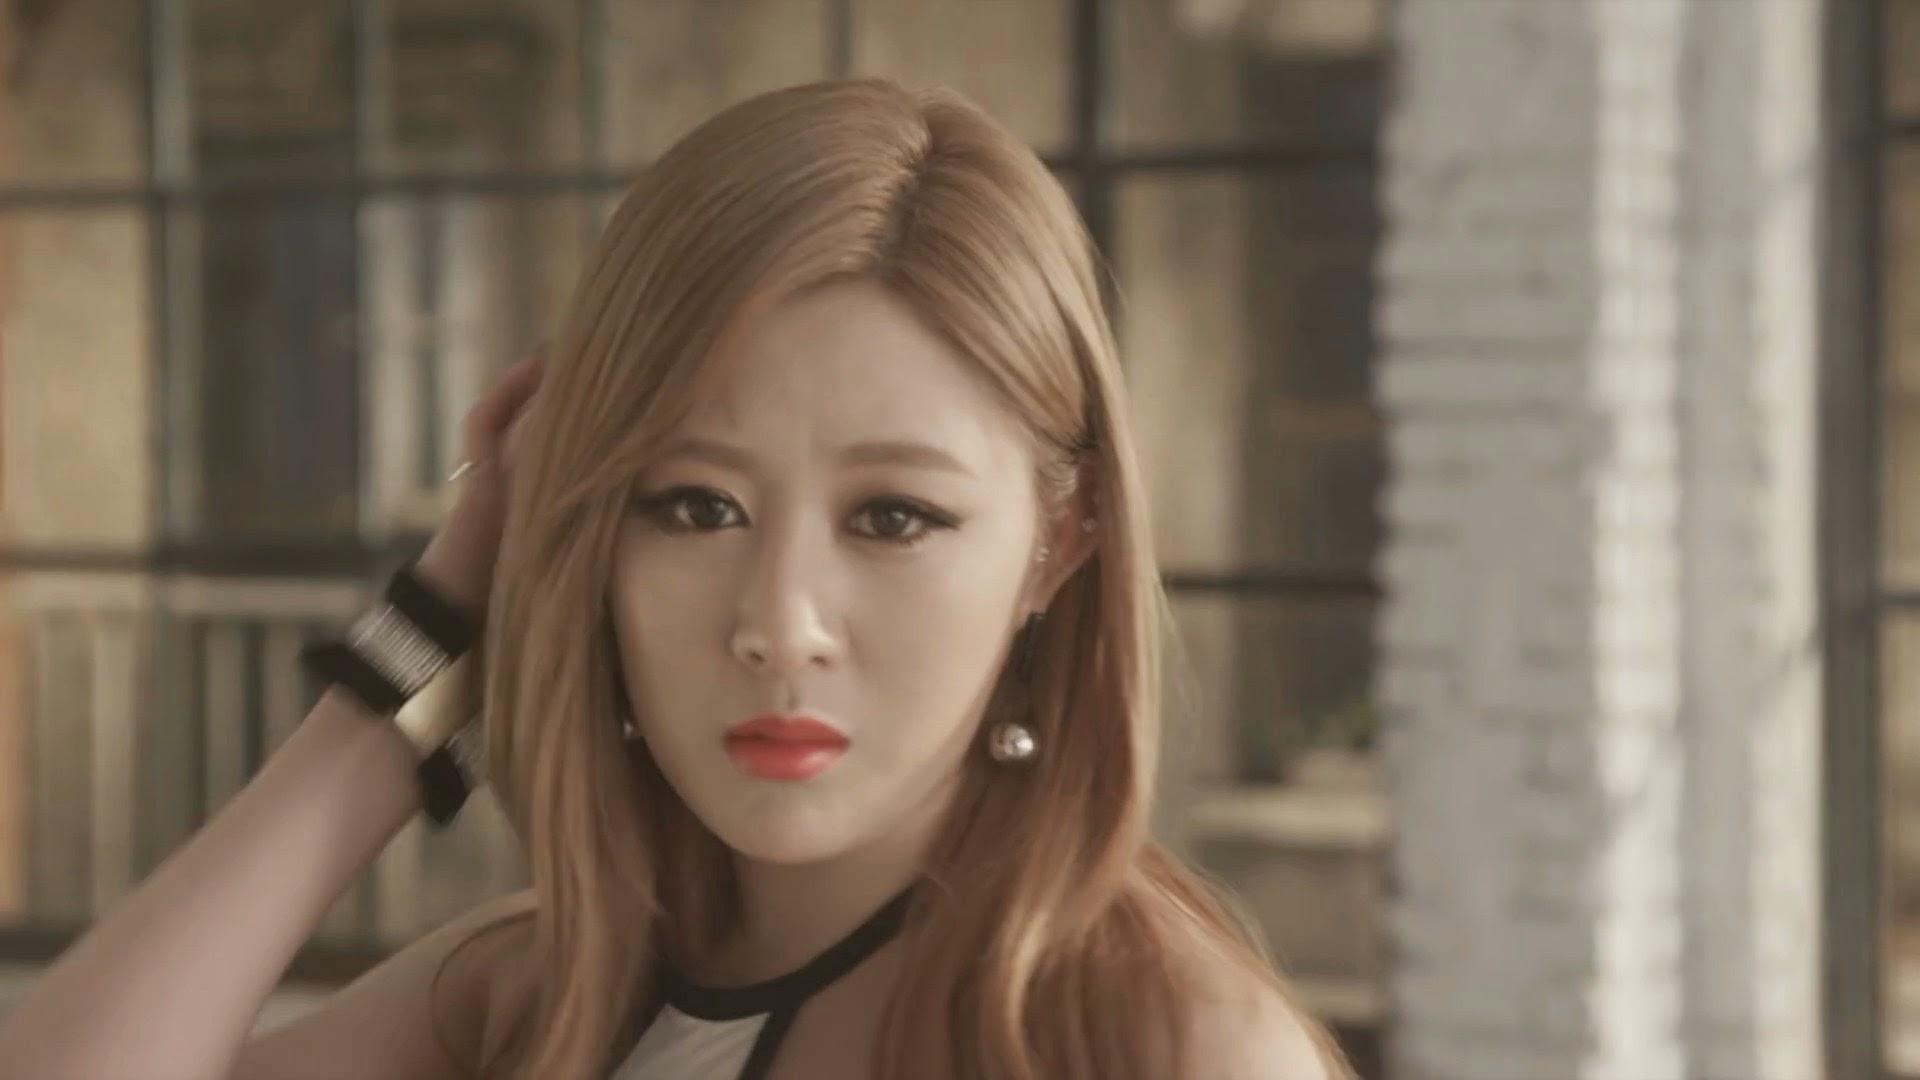 Pocket Girls' Jua in Bbang Bbang MV